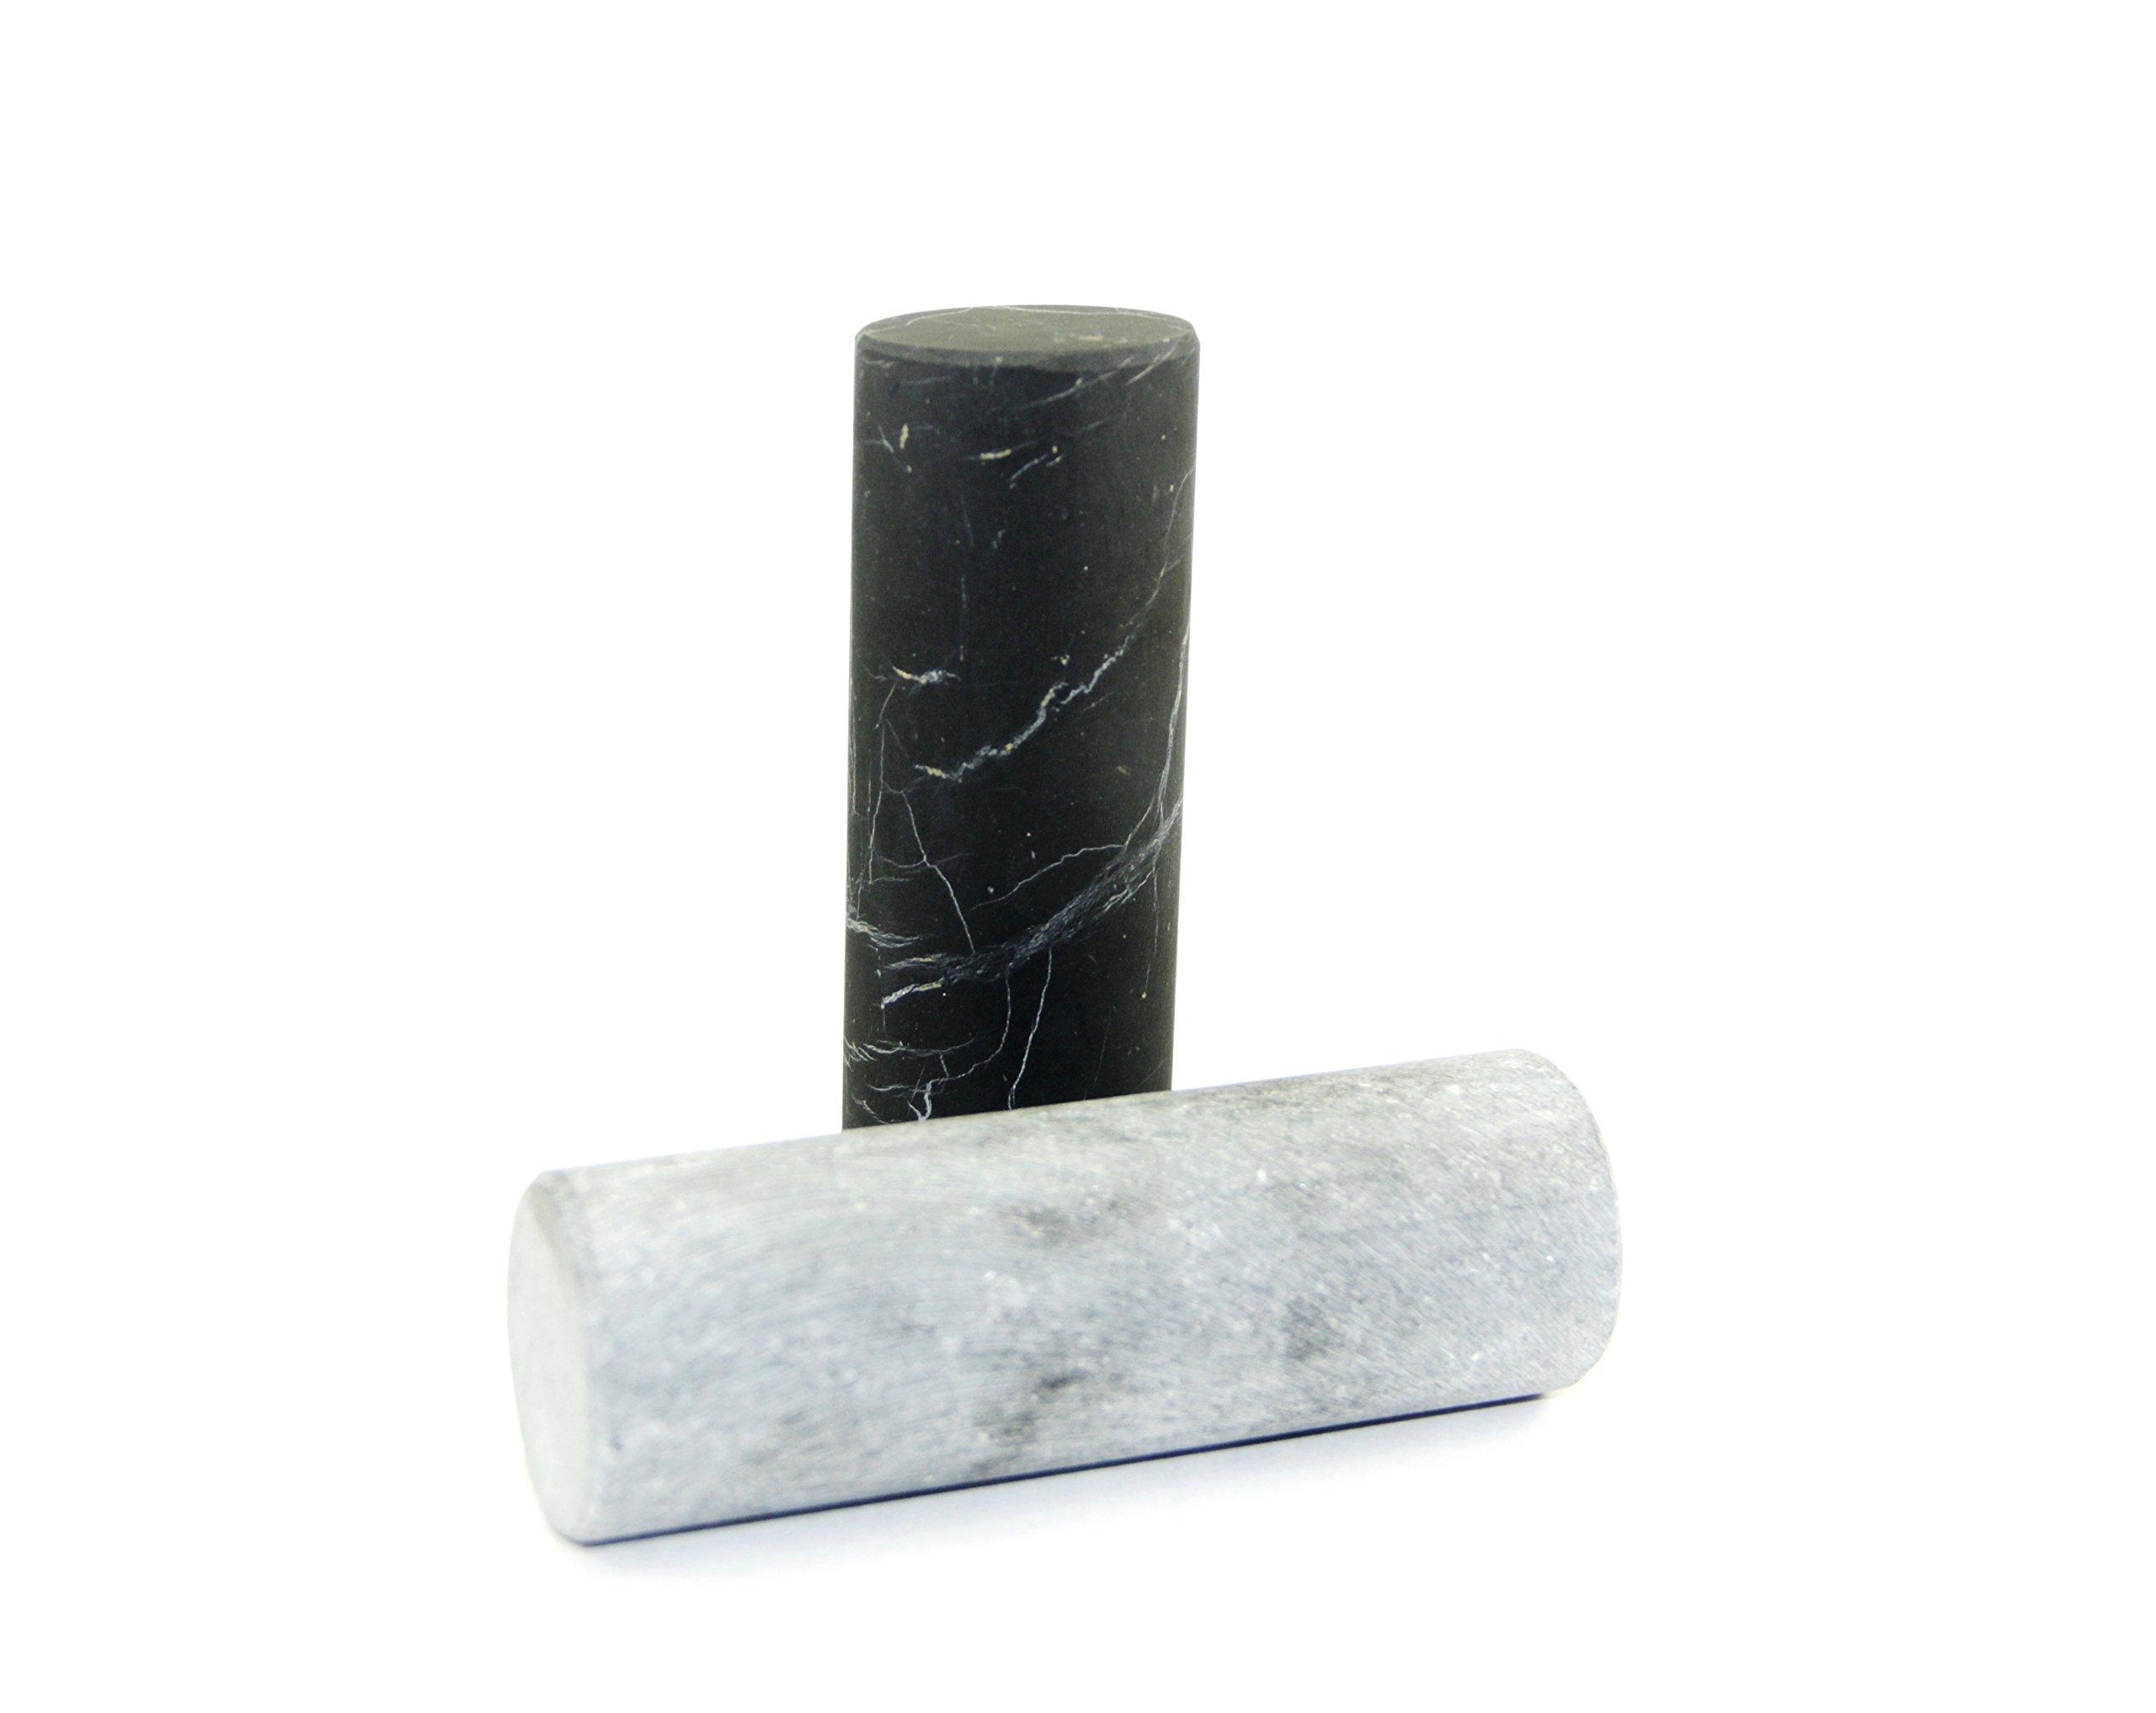 Unpolished Shungite Crystal Pharaoh Cylinders - 100% natural unpolished gemstone - Russia Stone - Gem - Semi precious Mineral - Reiki, Meditation, Crystal Healing - Alien Stone by Crystal Dreams (Image #2)